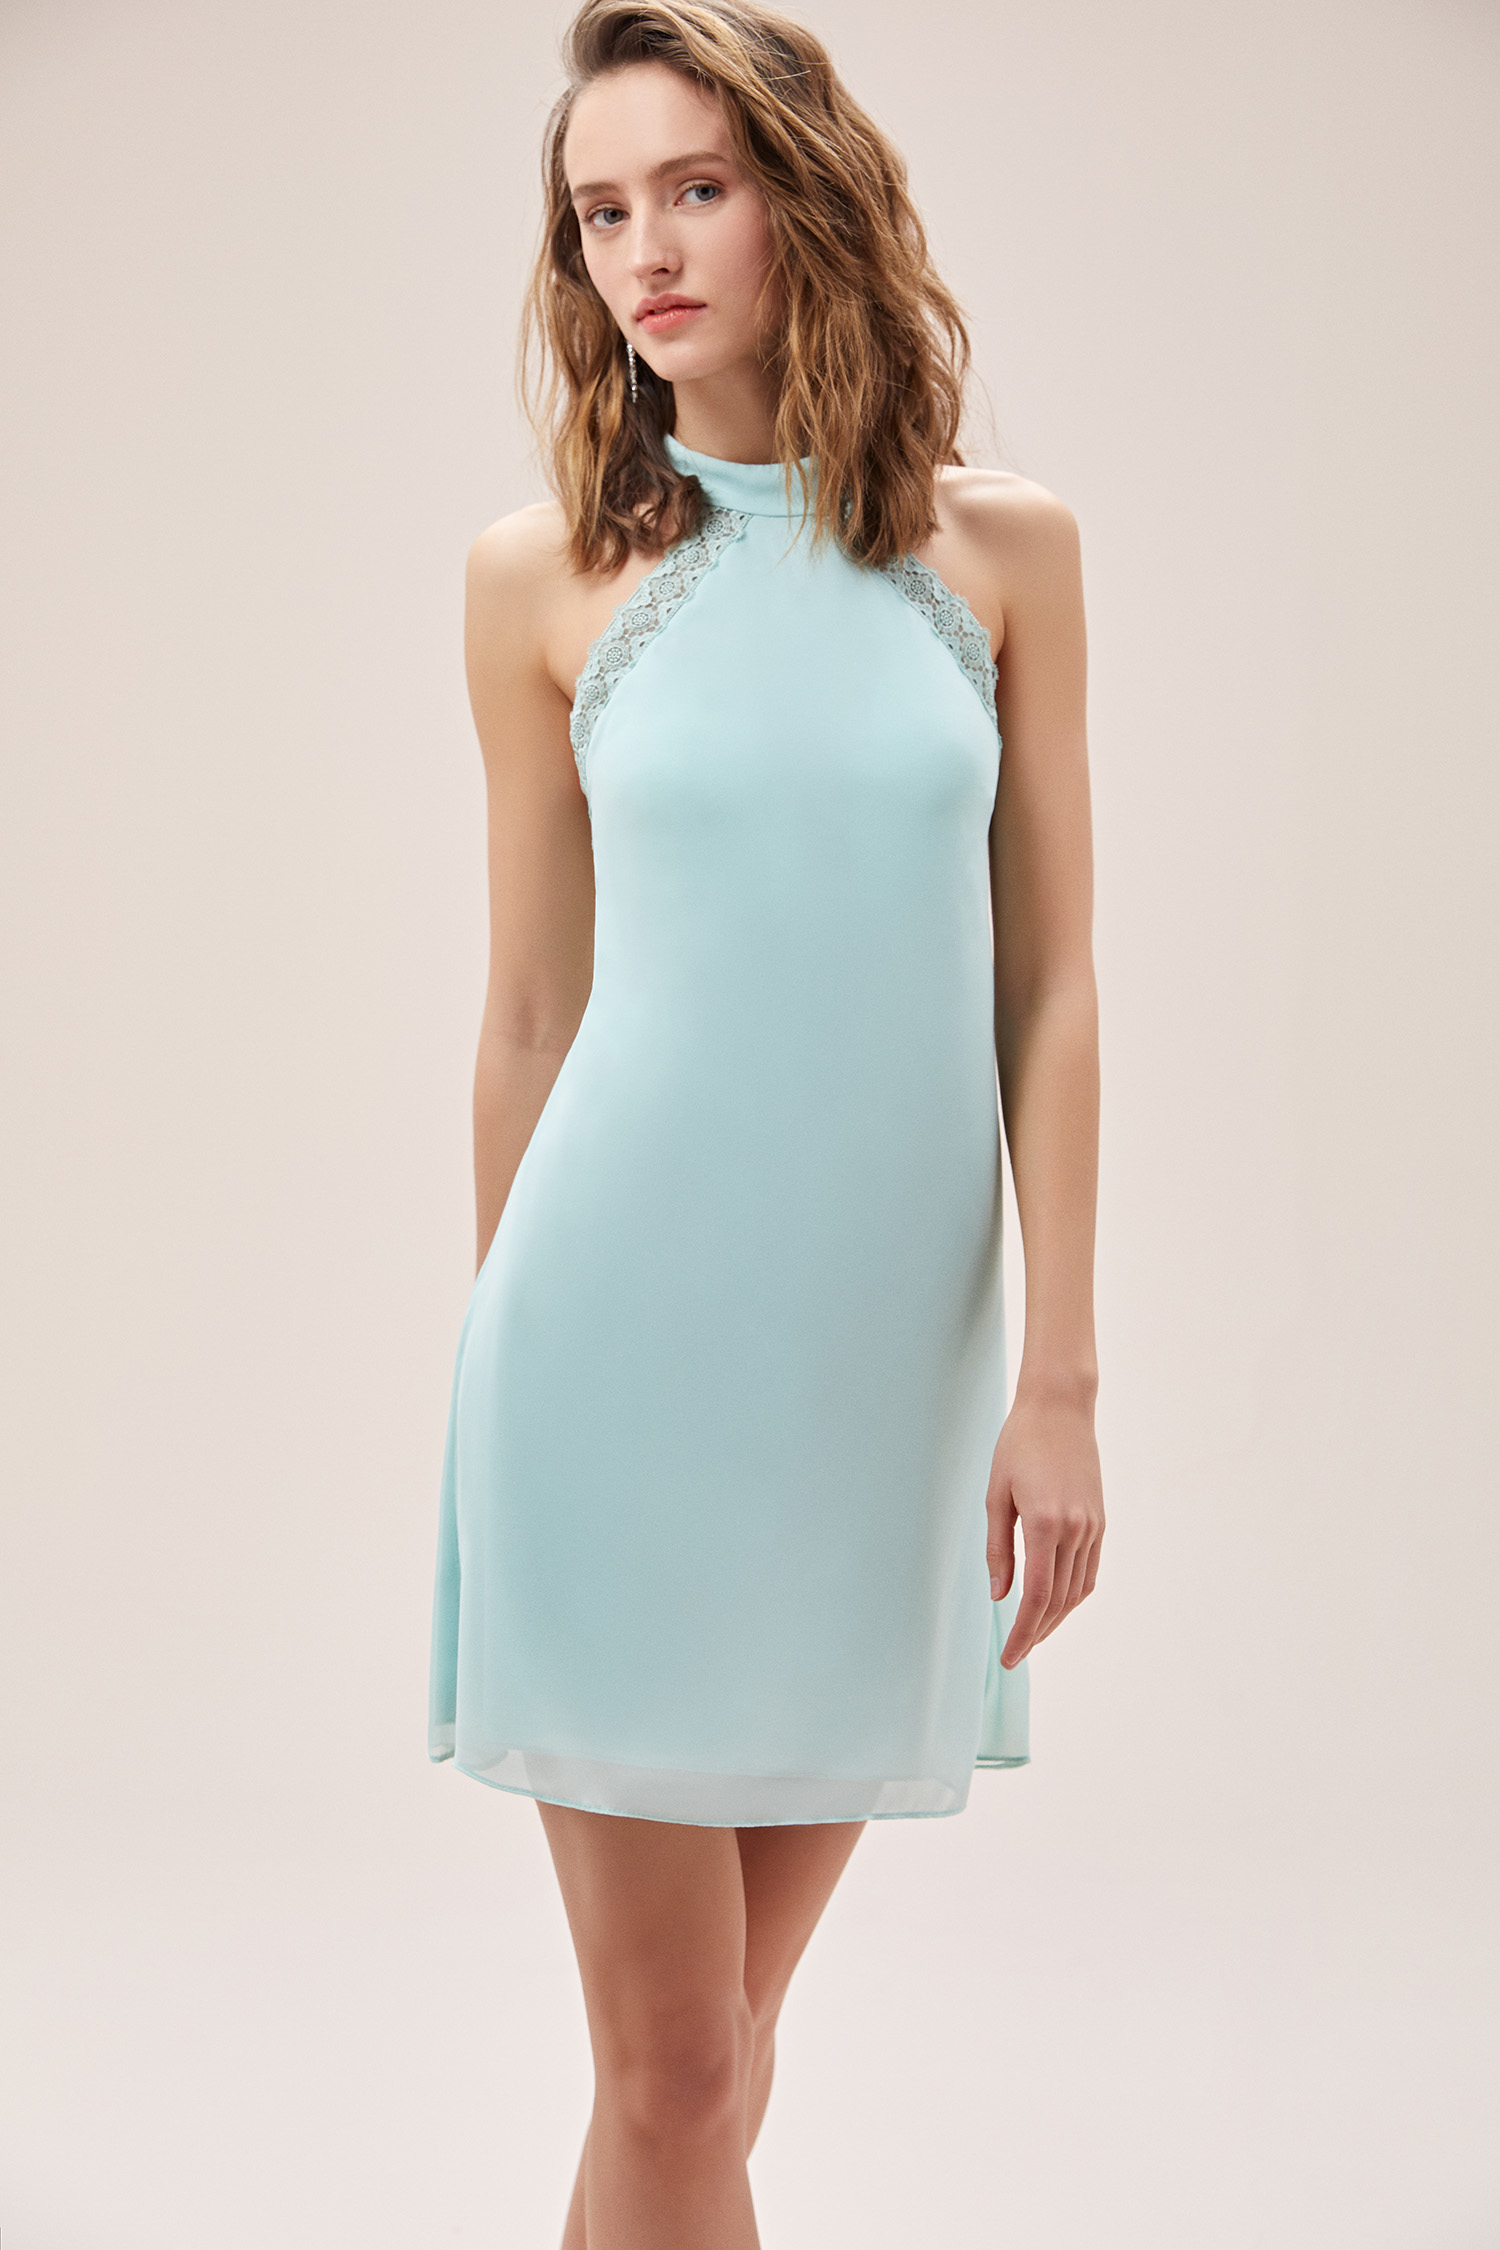 Su Yeşili Halter Yaka Sırt Dekolteli Şifon Mini Elbise - Thumbnail